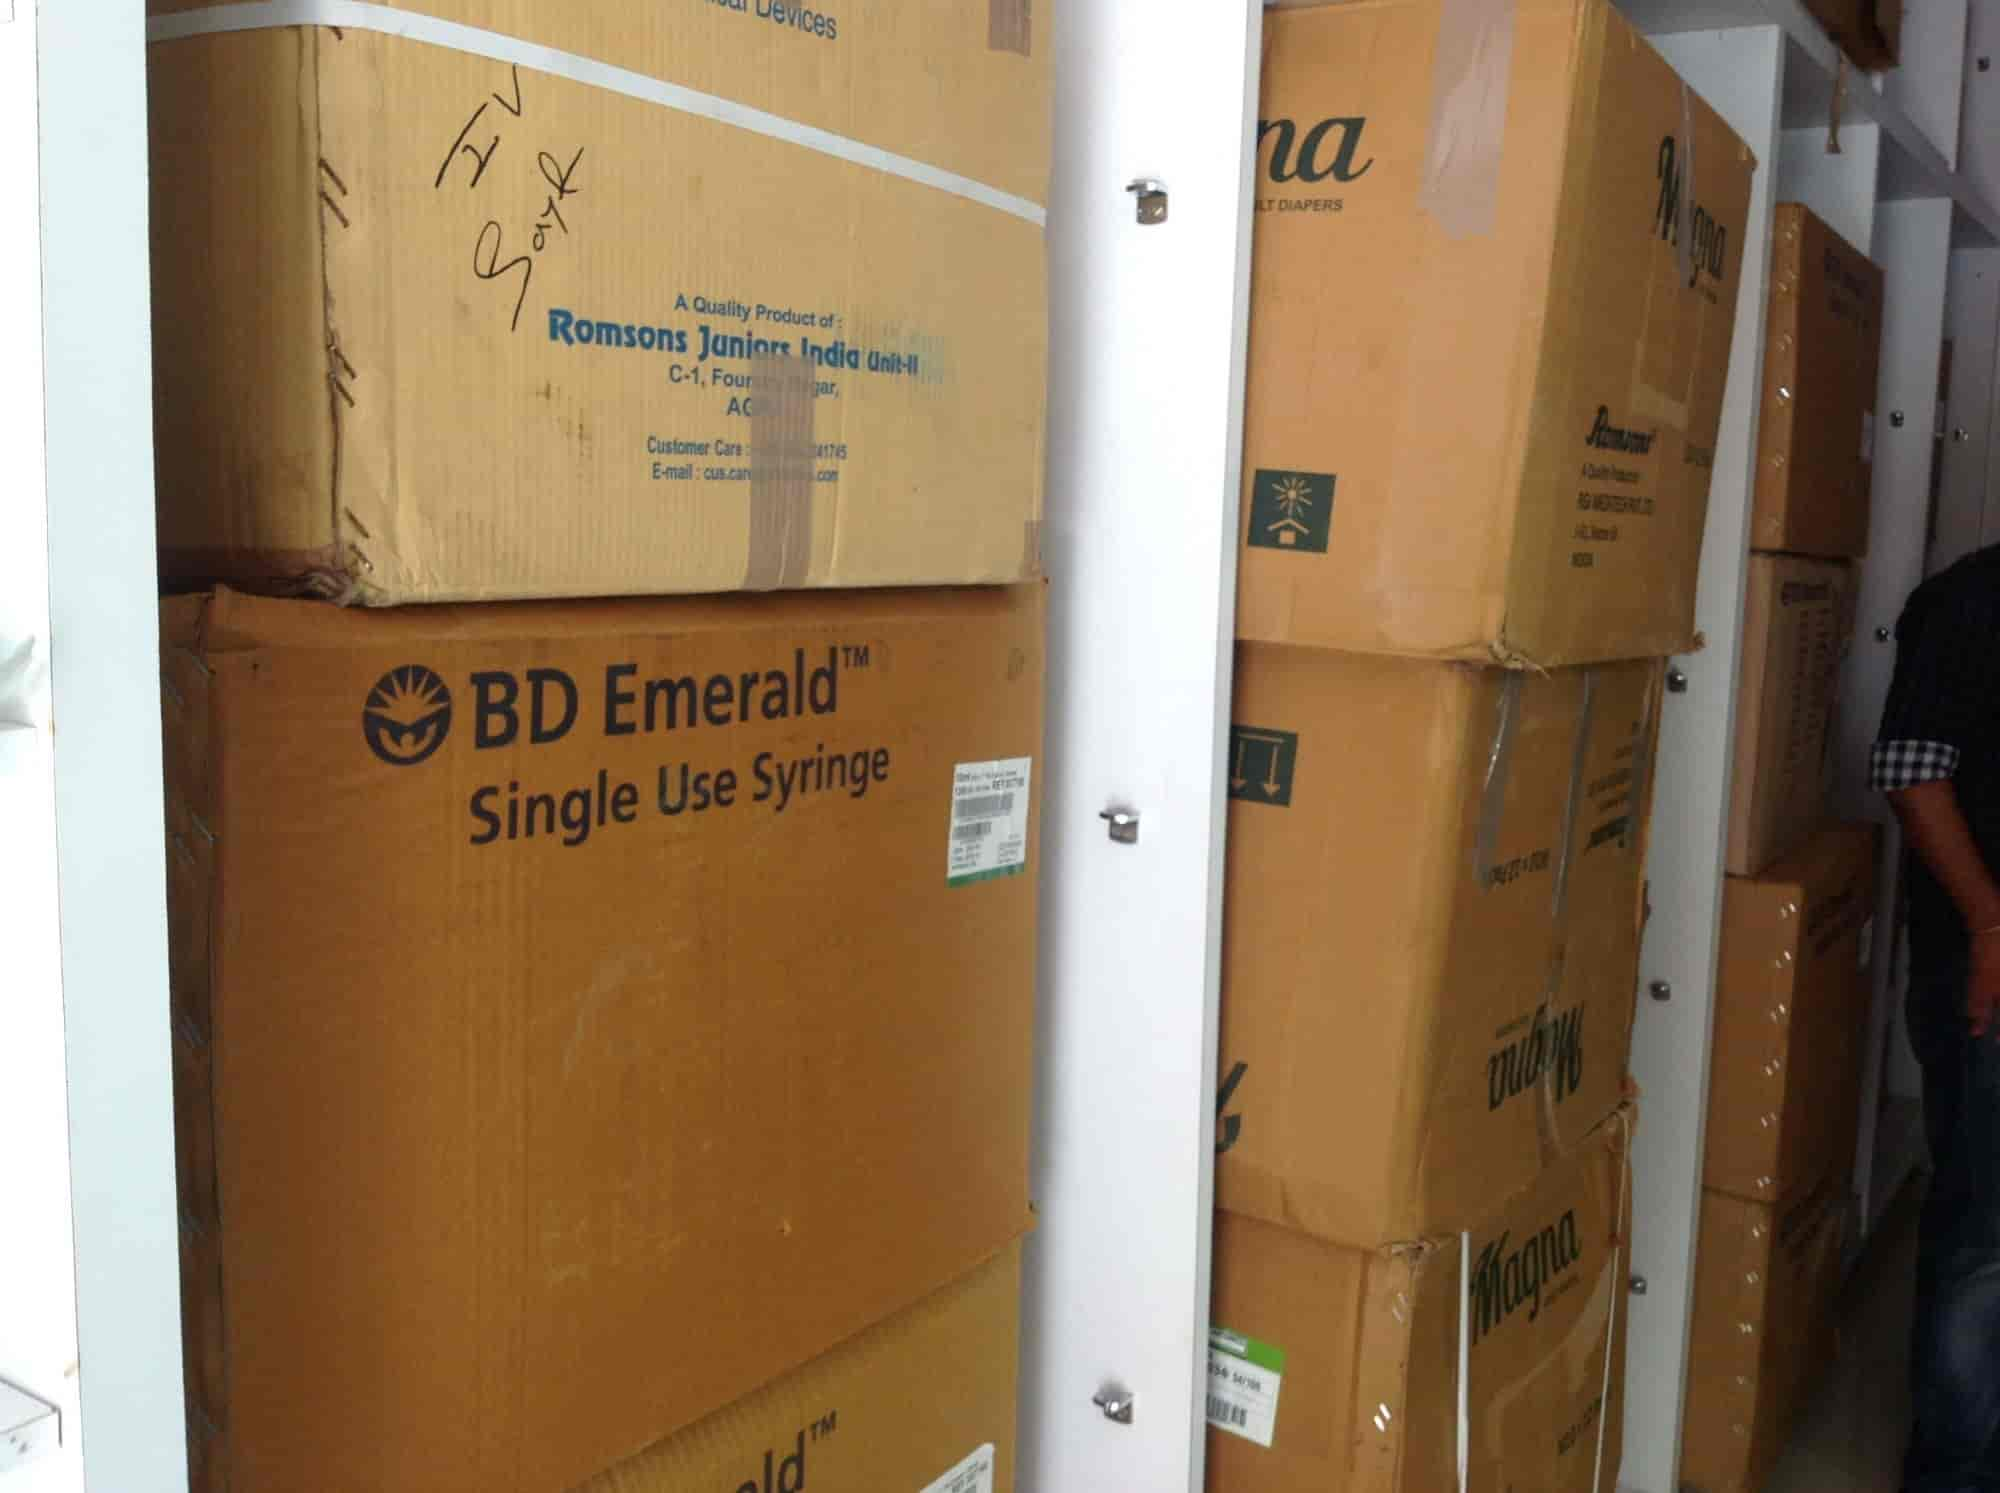 Medisurge JBP, Napier Town - Medical Equipment Dealers in